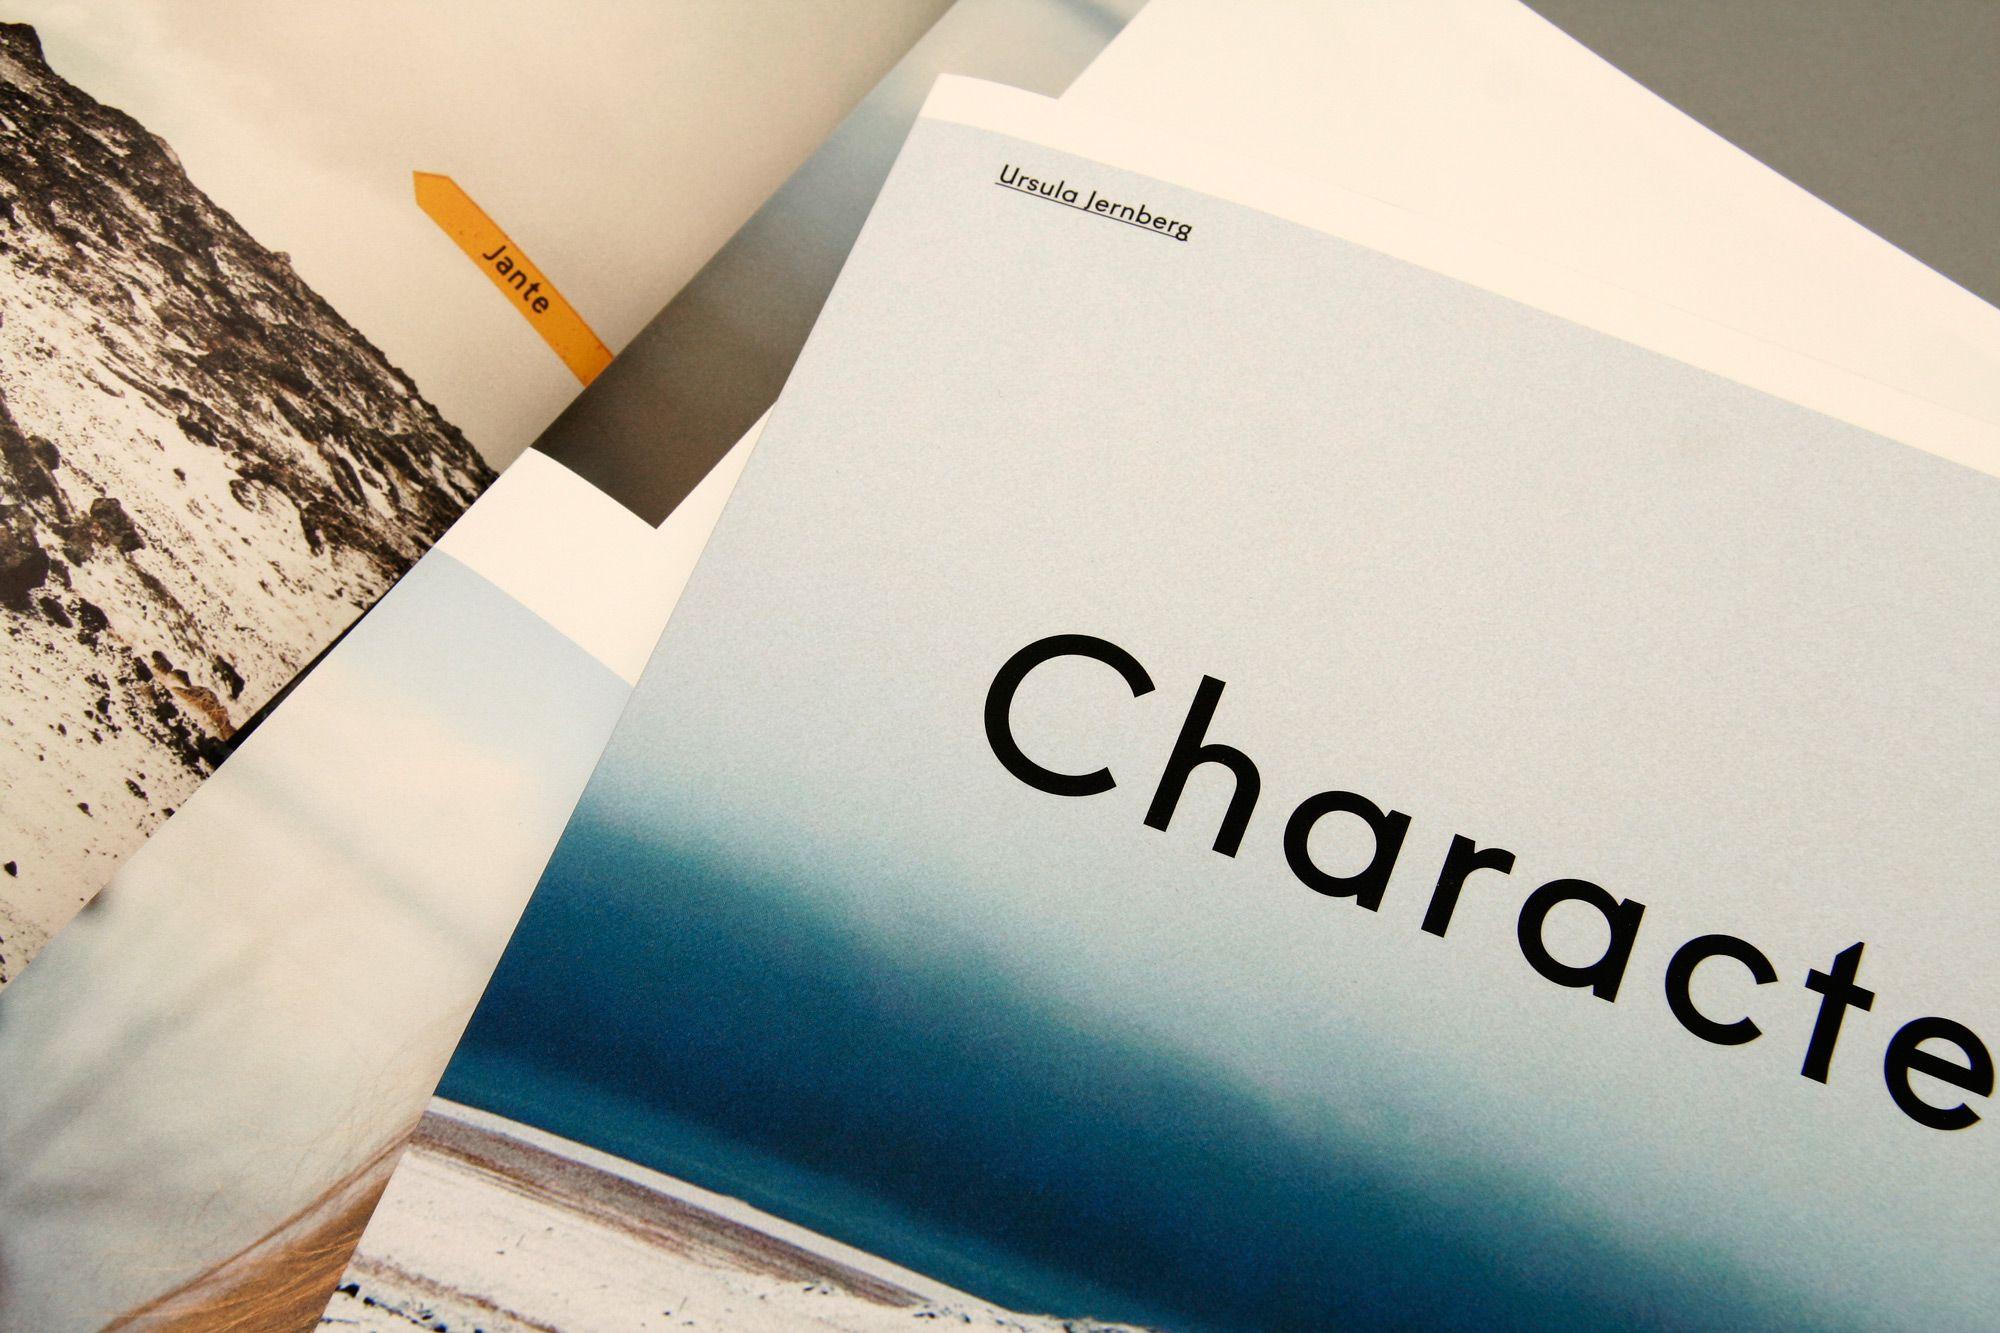 BarbaraHennequin-UJ-CharactersOfJante-02